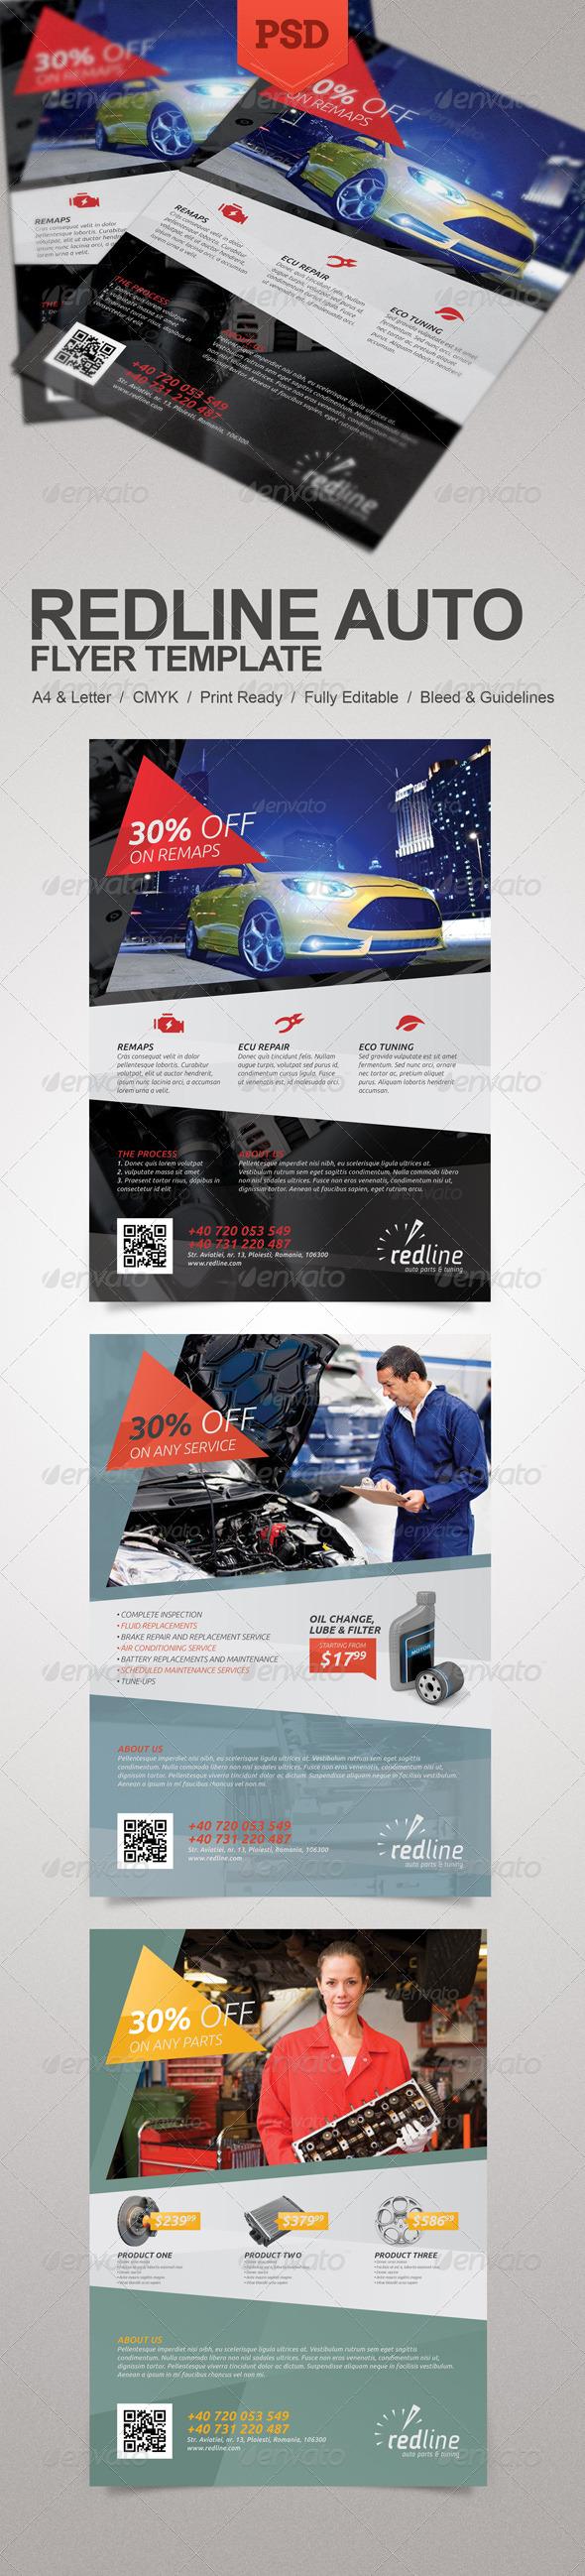 GraphicRiver Redline Auto Flyer 5712728